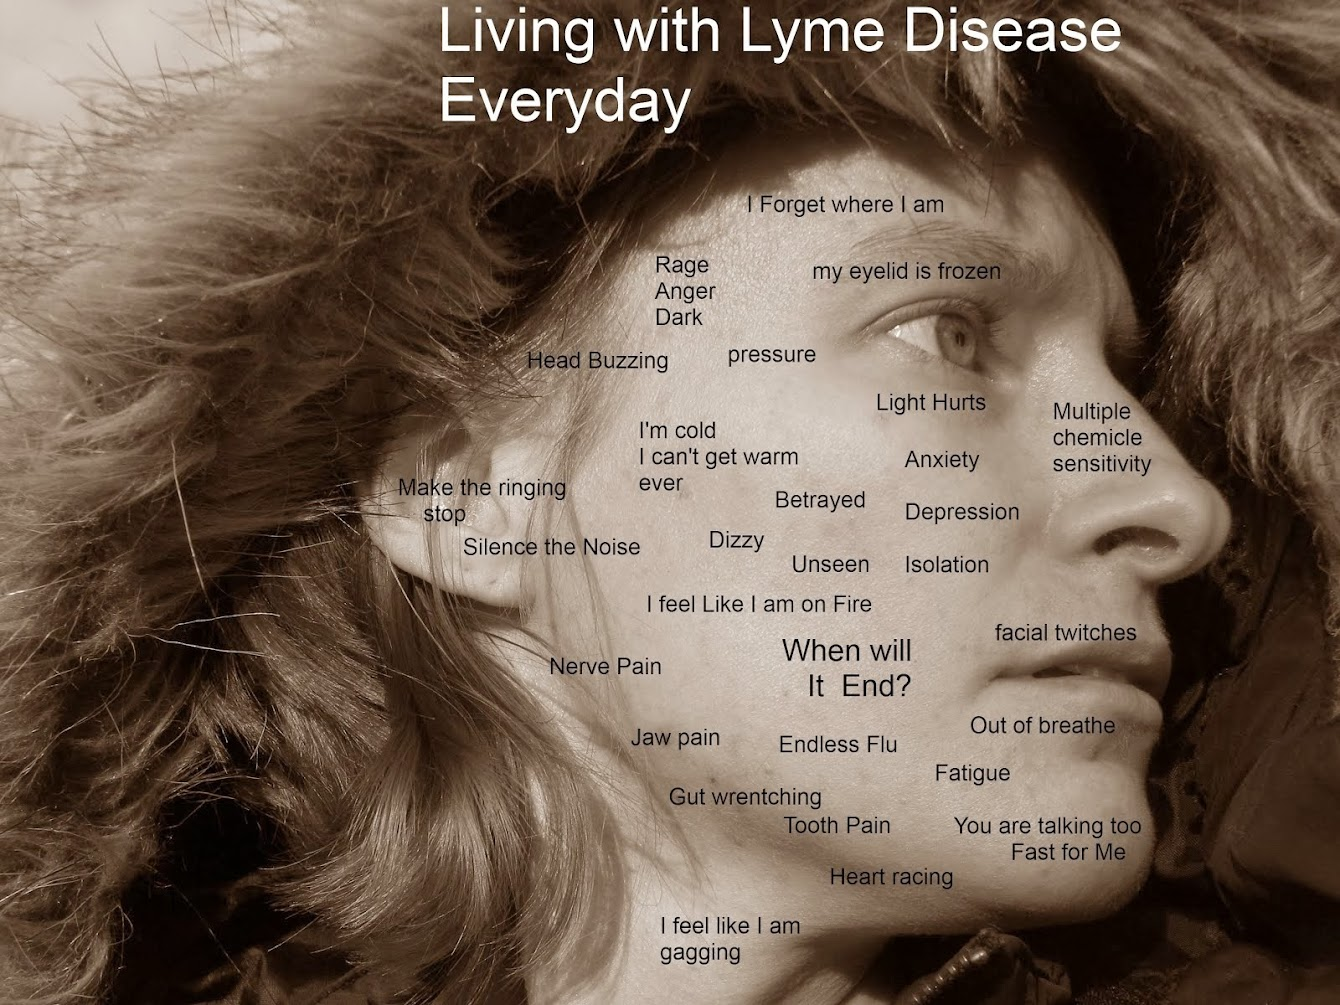 Overcoming Lyme